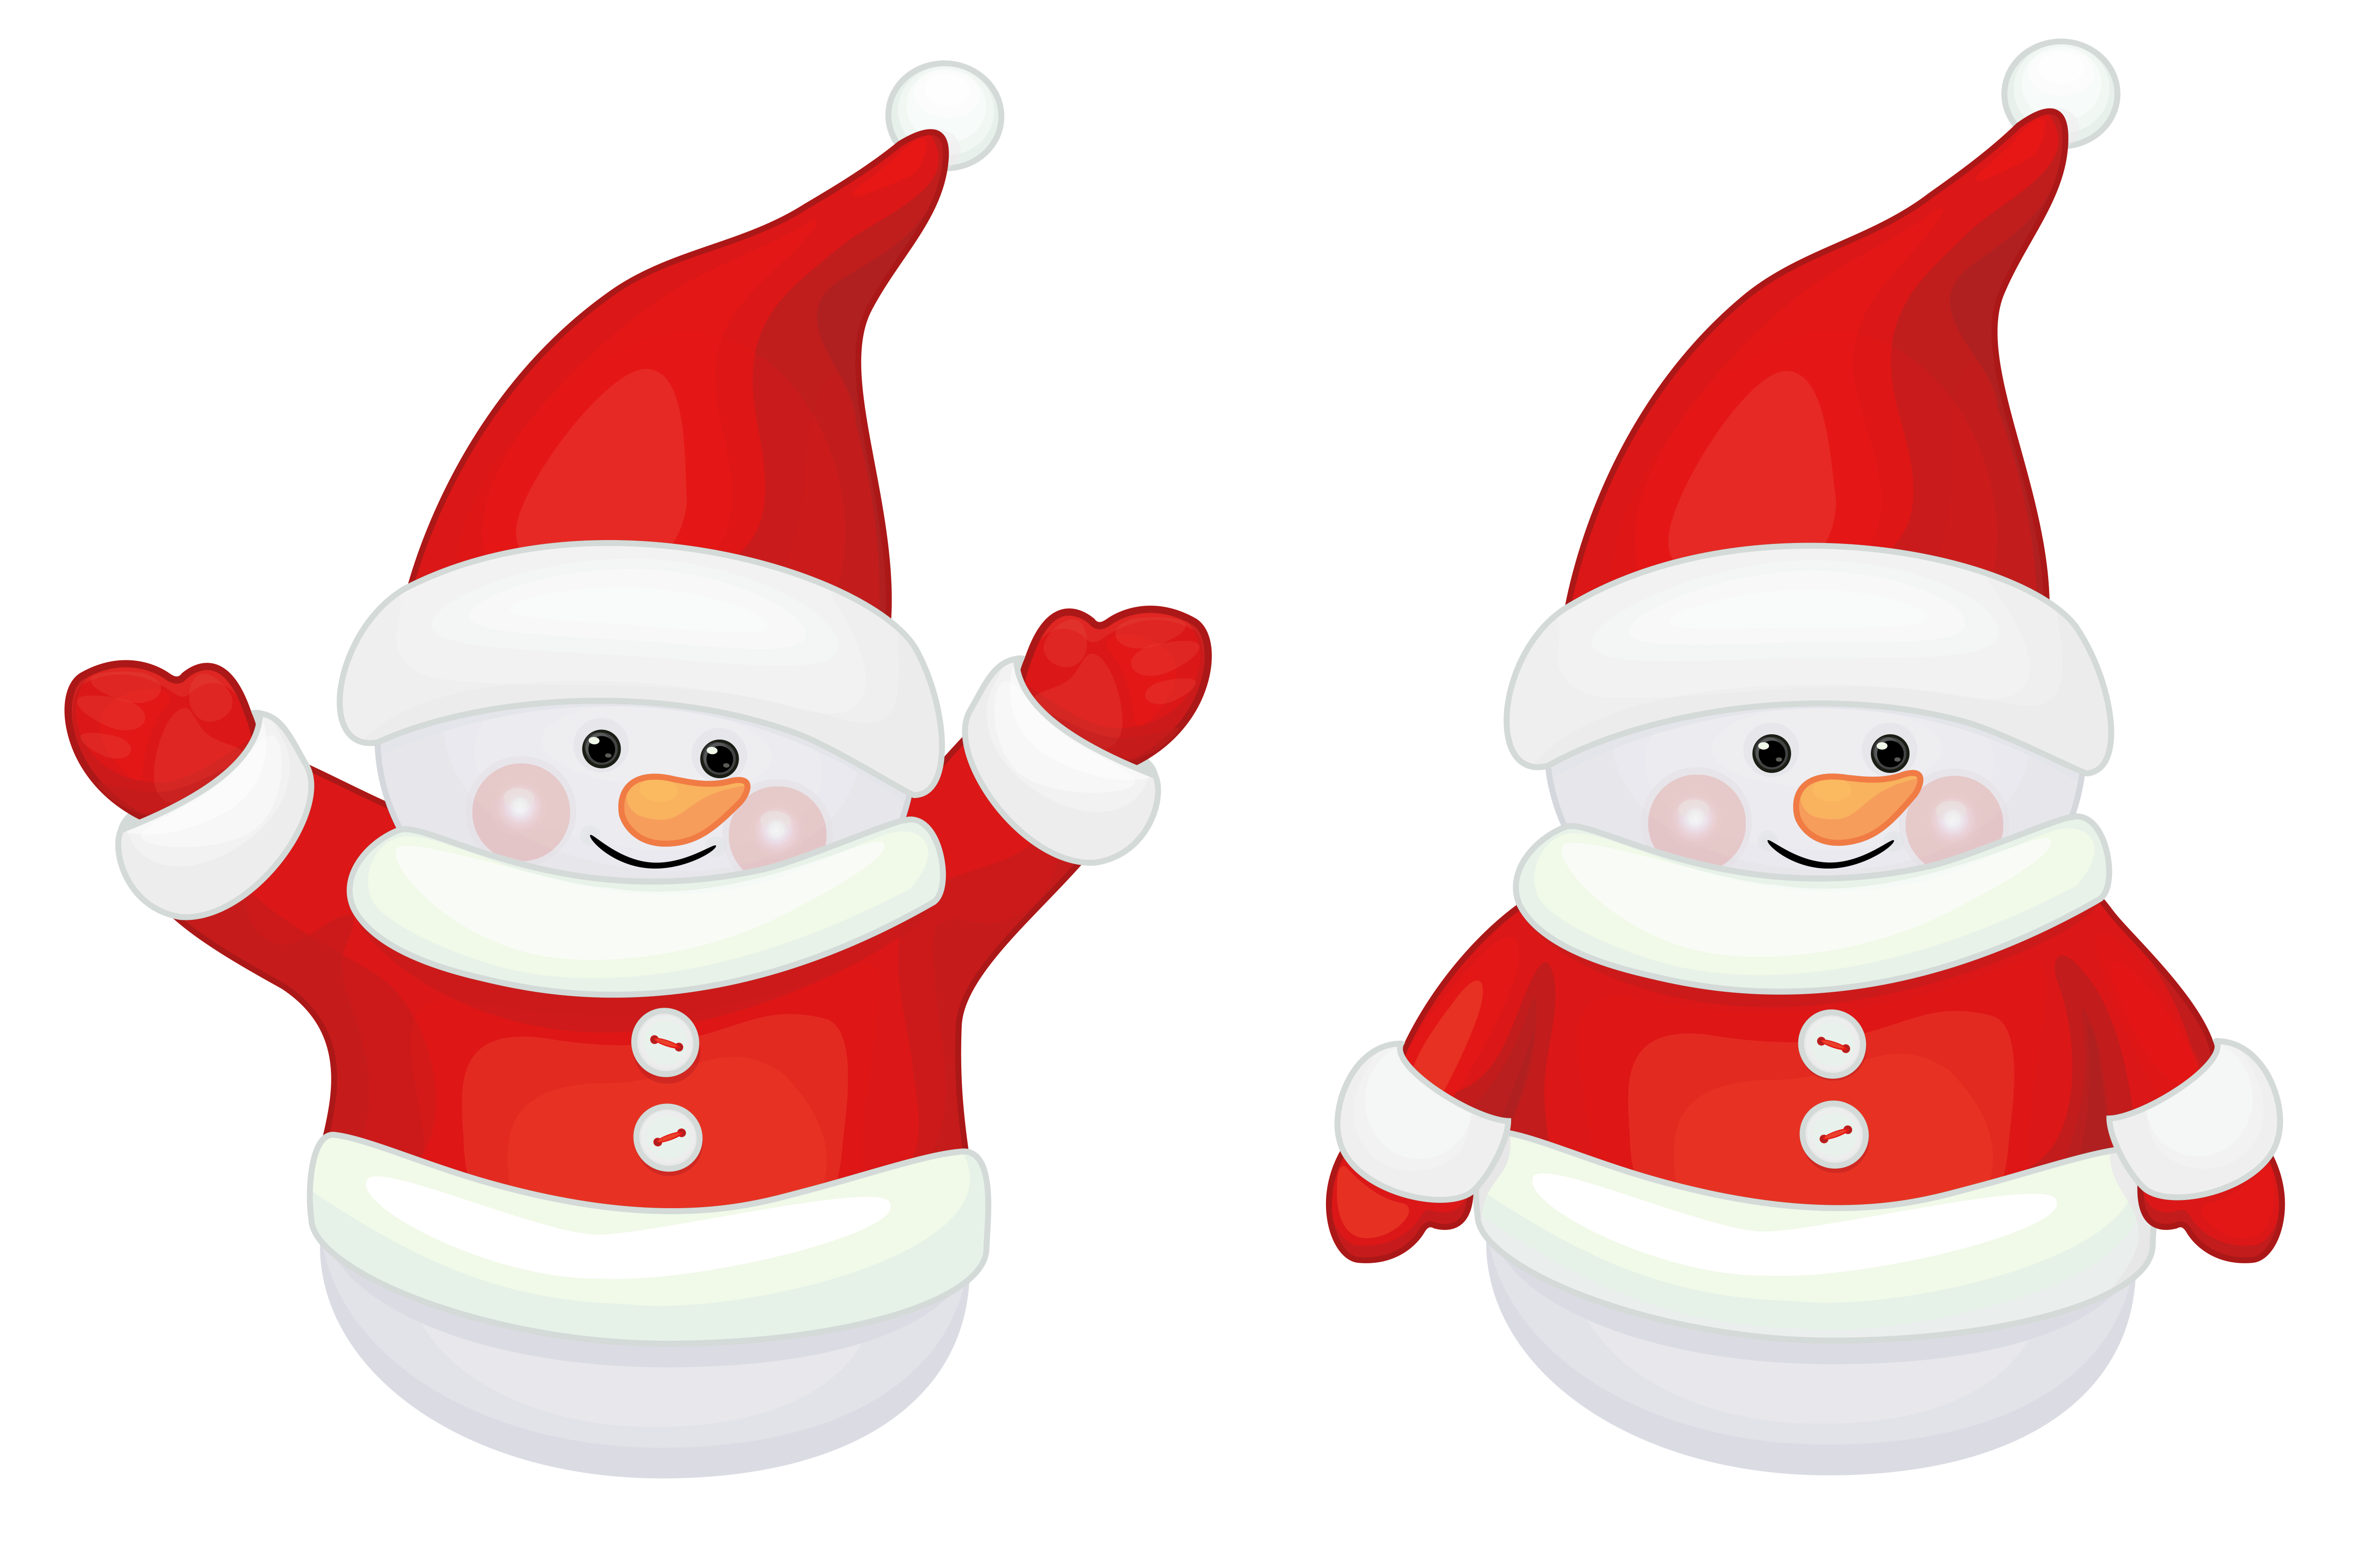 clip art royalty free stock Claus clipart cute. Transparent red santa decor.